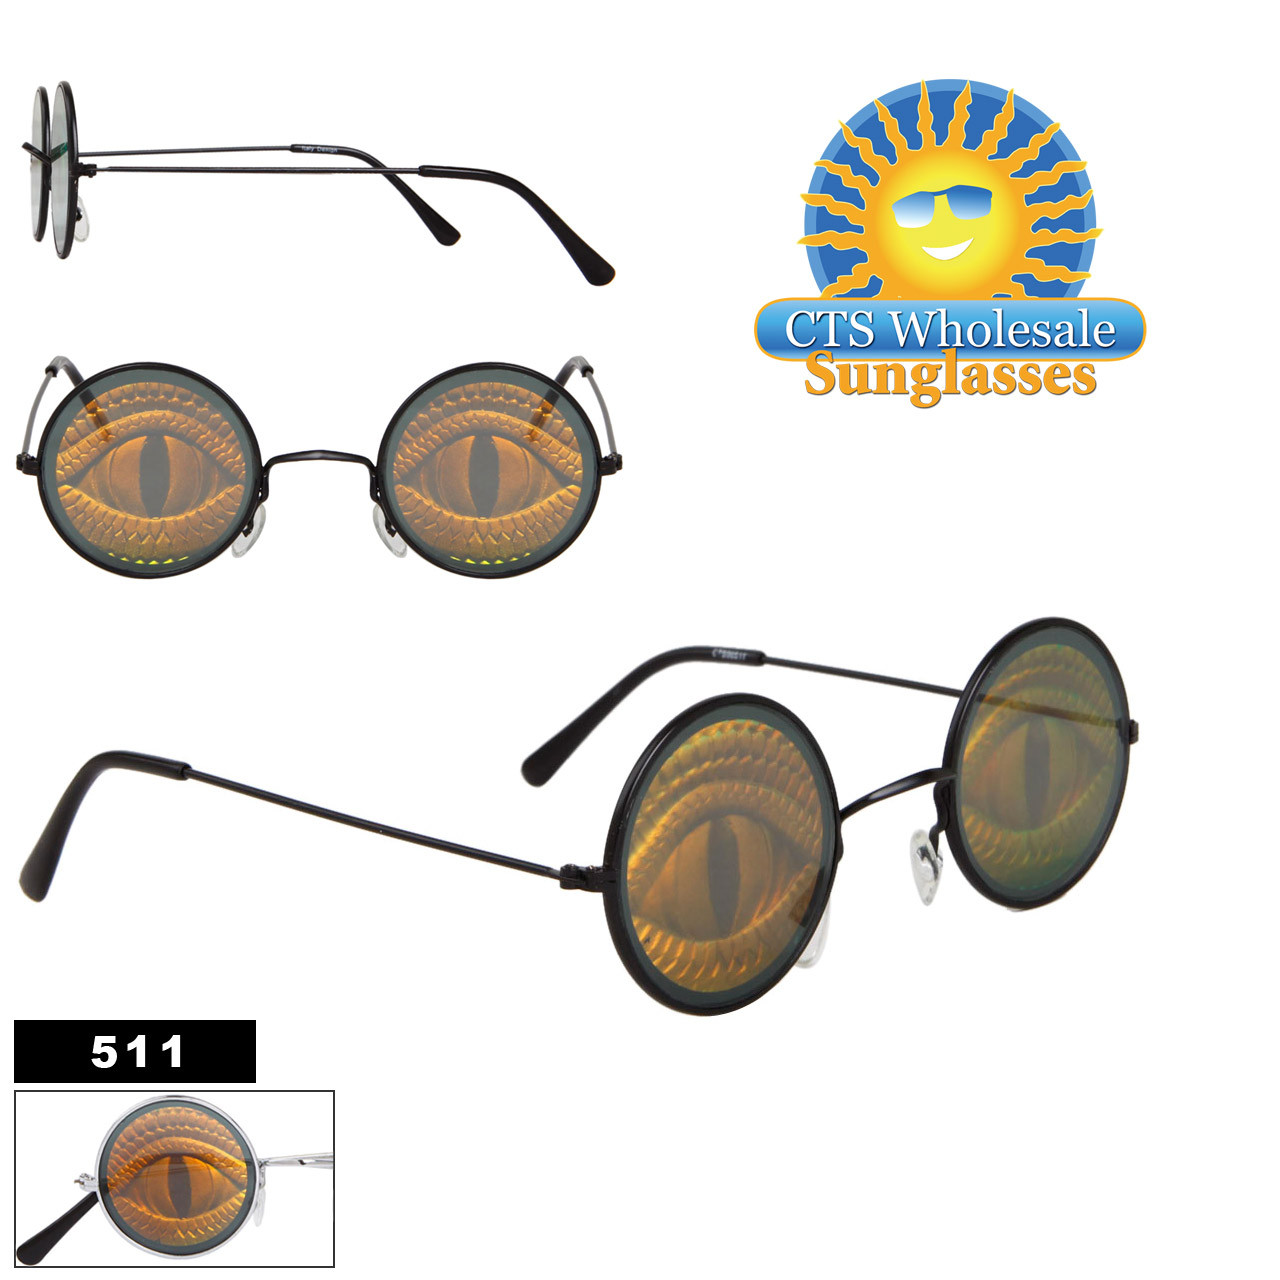 Reptile Eye Hologram Sunglasses 511